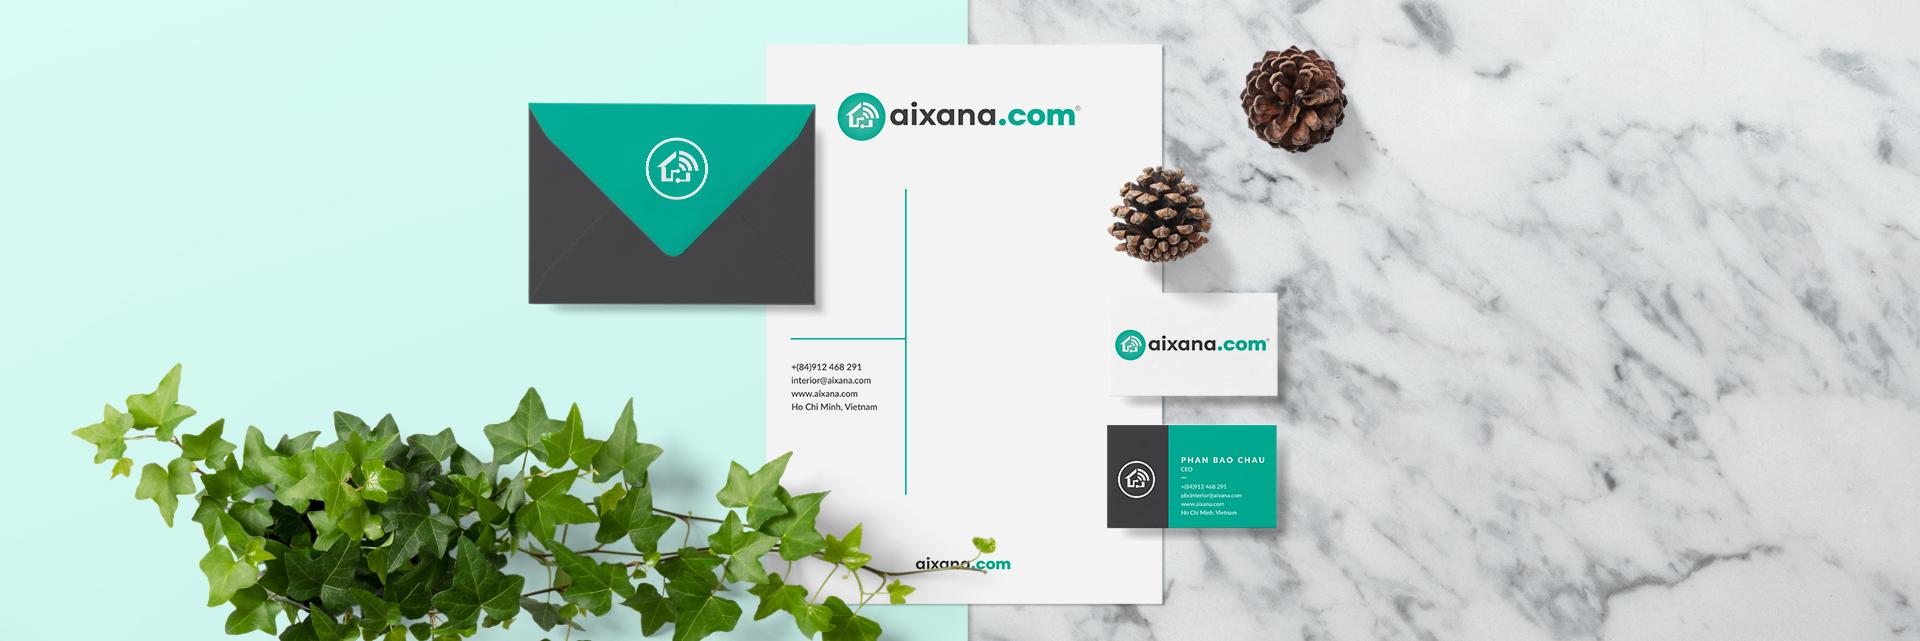 thiet-ke-in-an-logo-re-dep-aixana-slide1